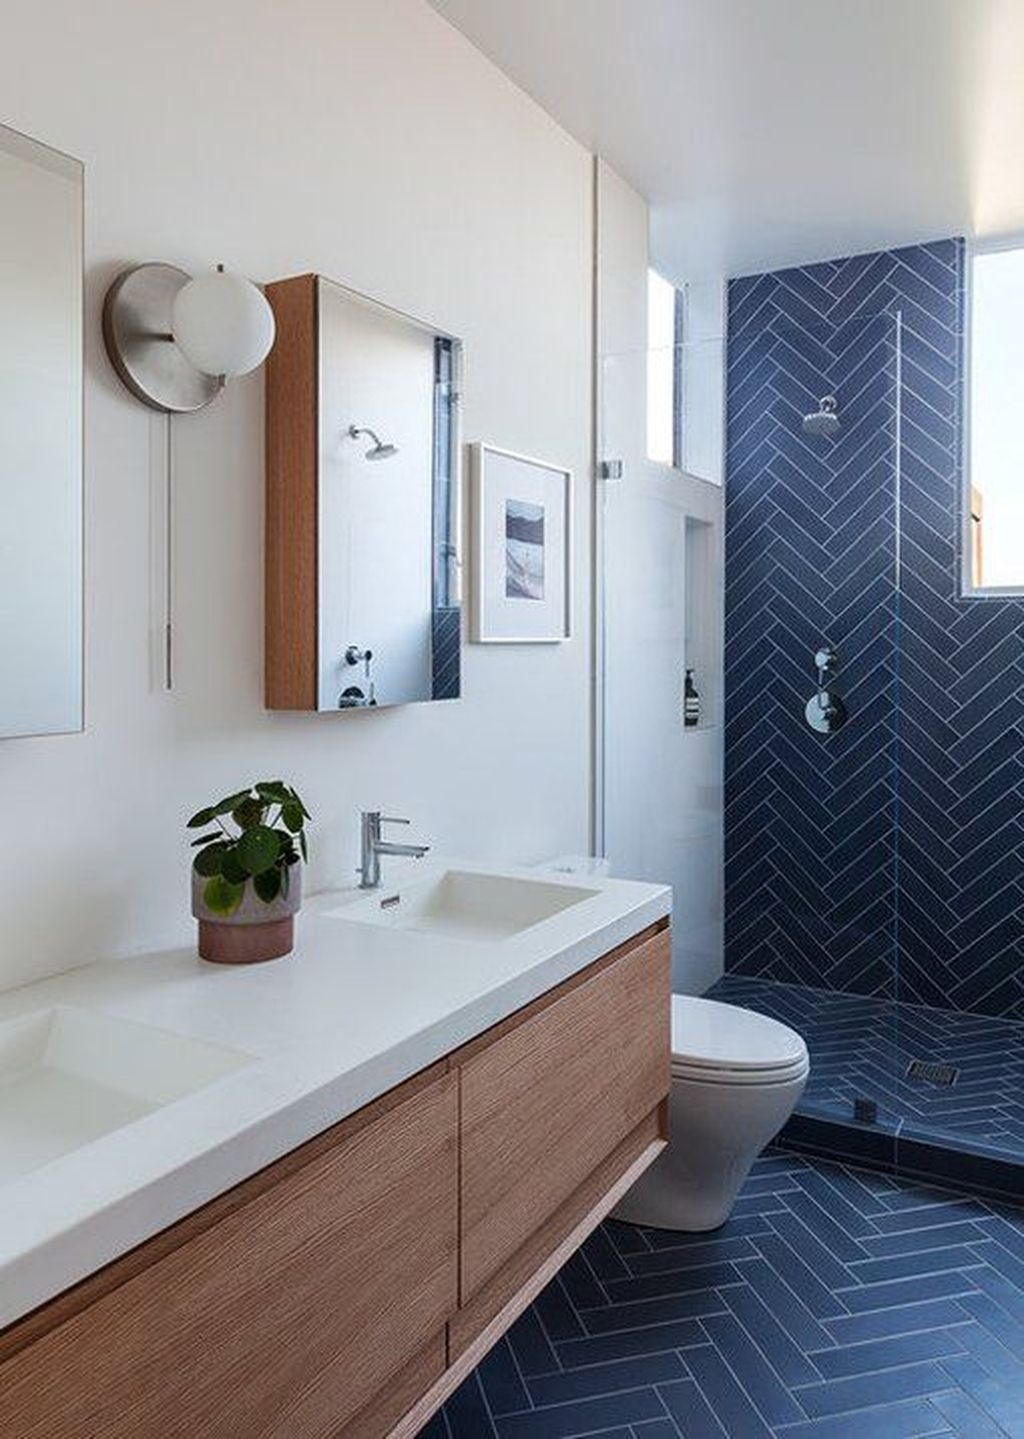 Inspiring Bathroom Tile Ideas 23